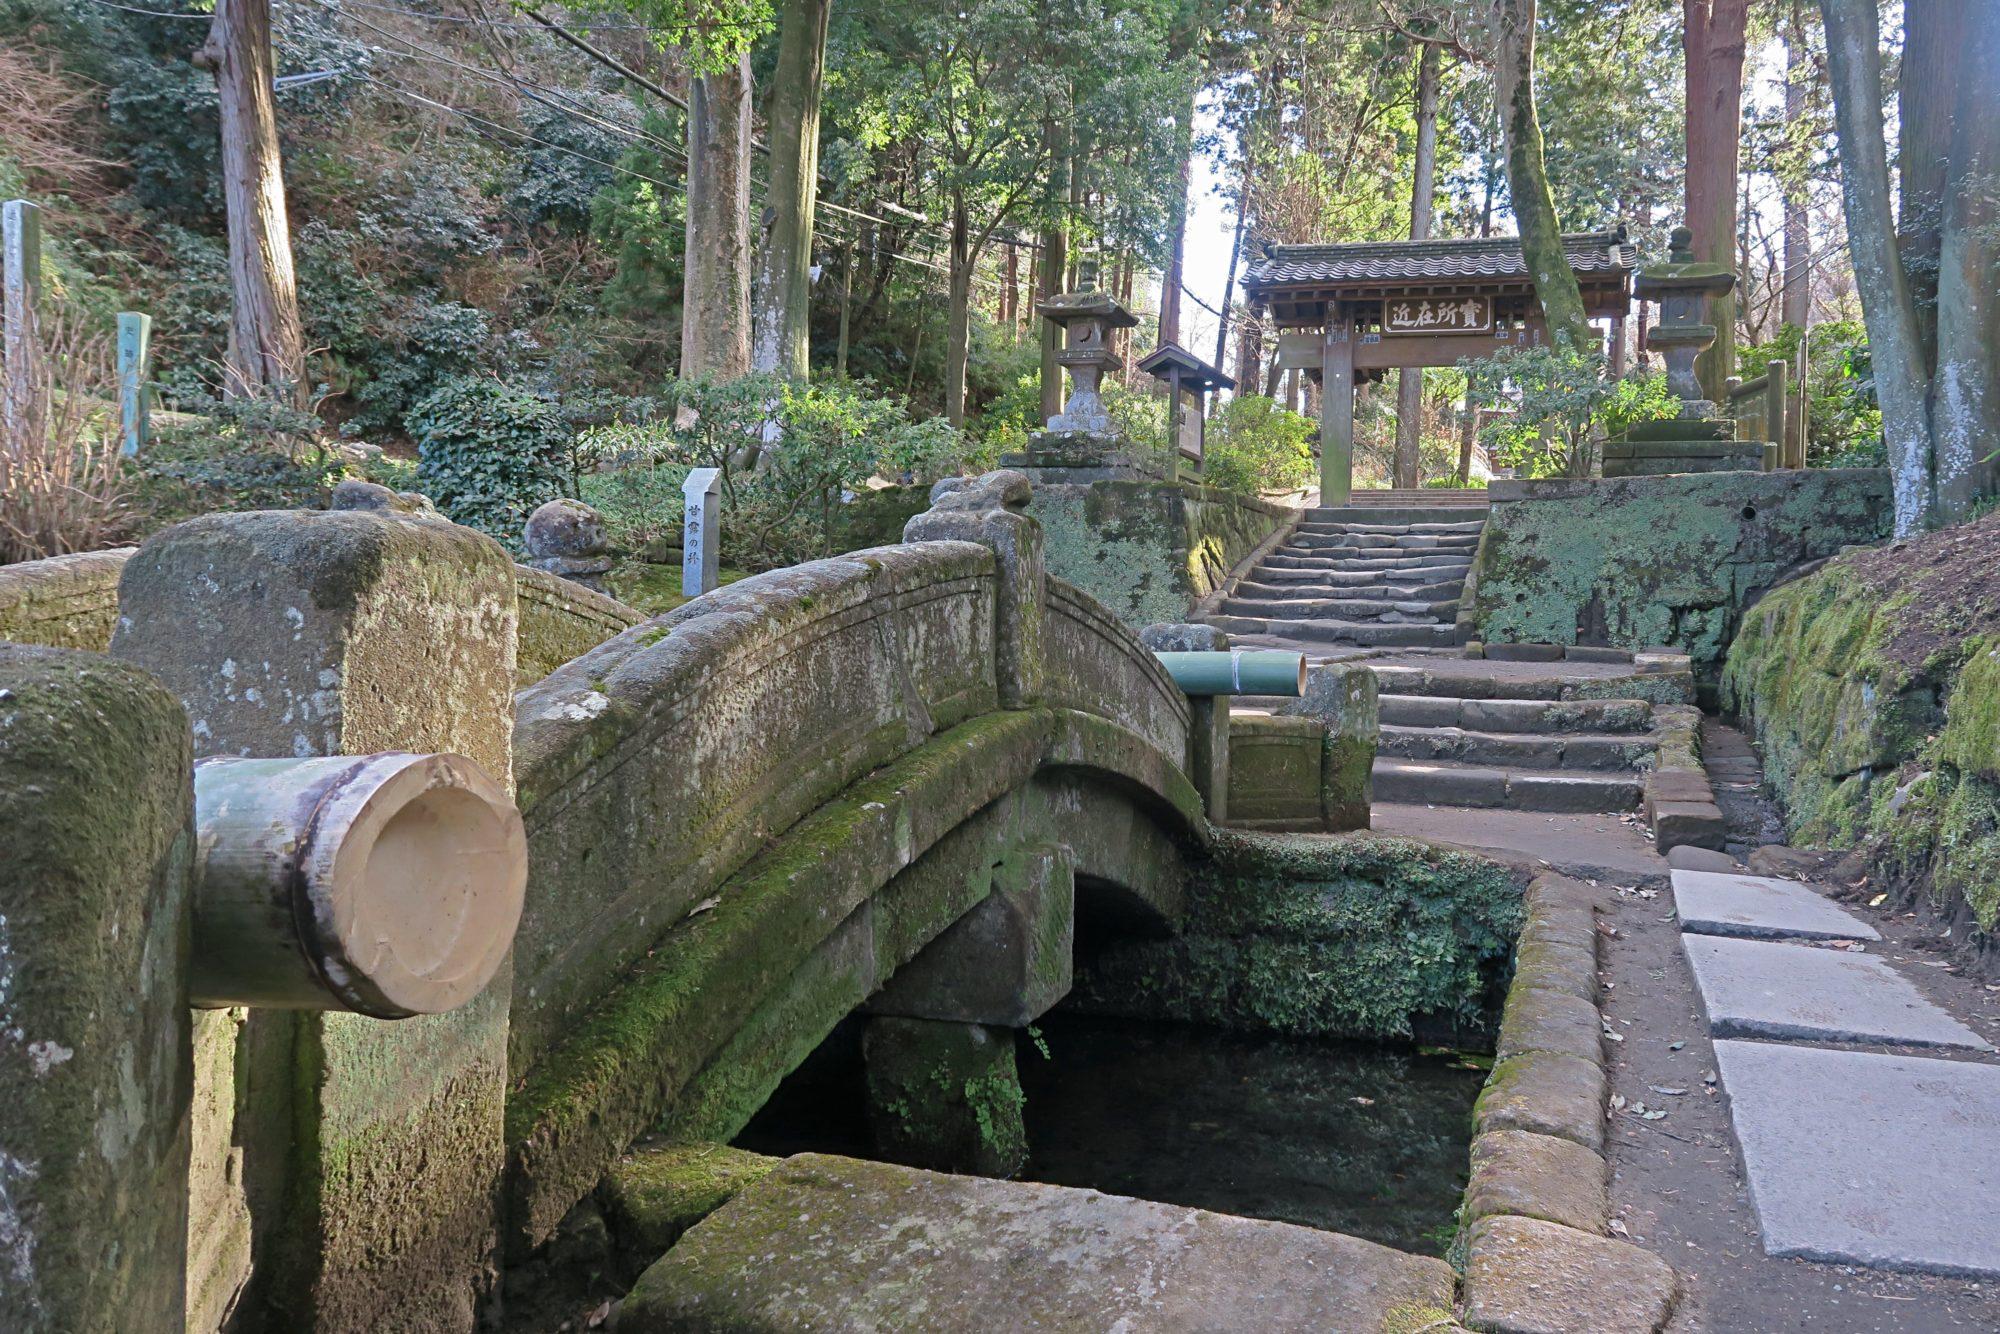 mittelalterliche brücke in kamakura, japan